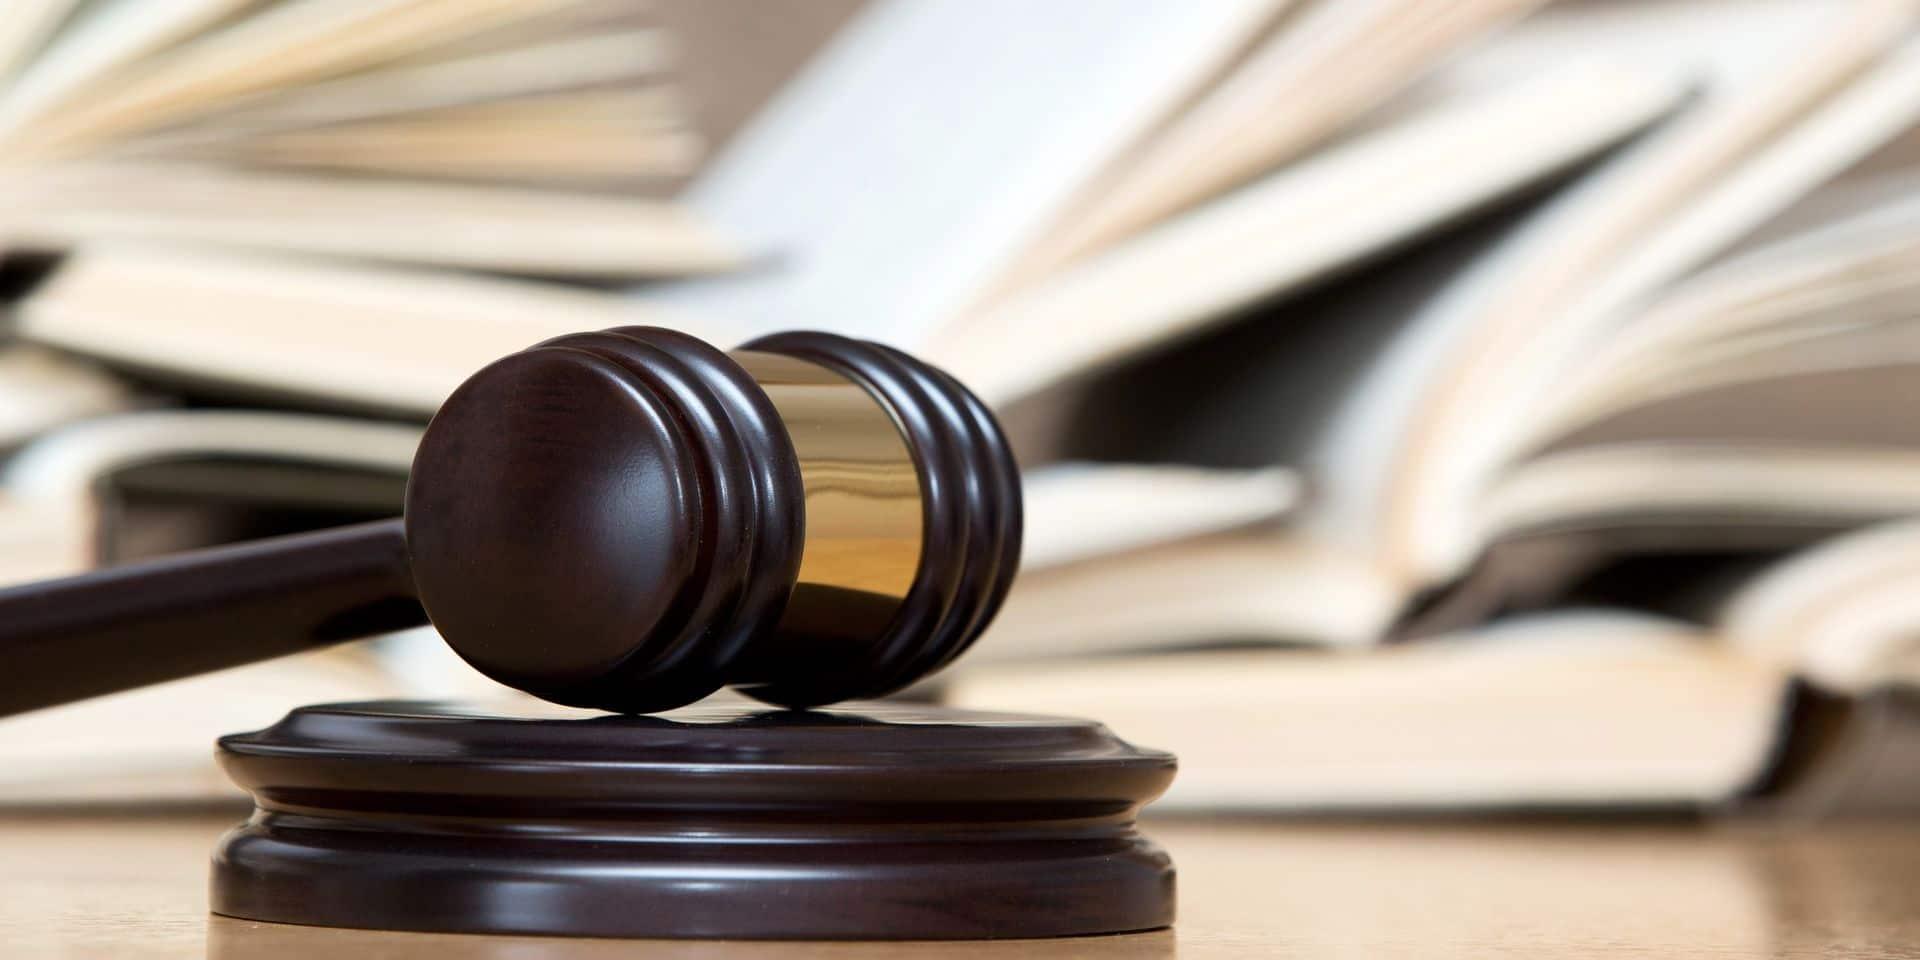 Robert Spatz, Le gourou de l'OKC, est condamné